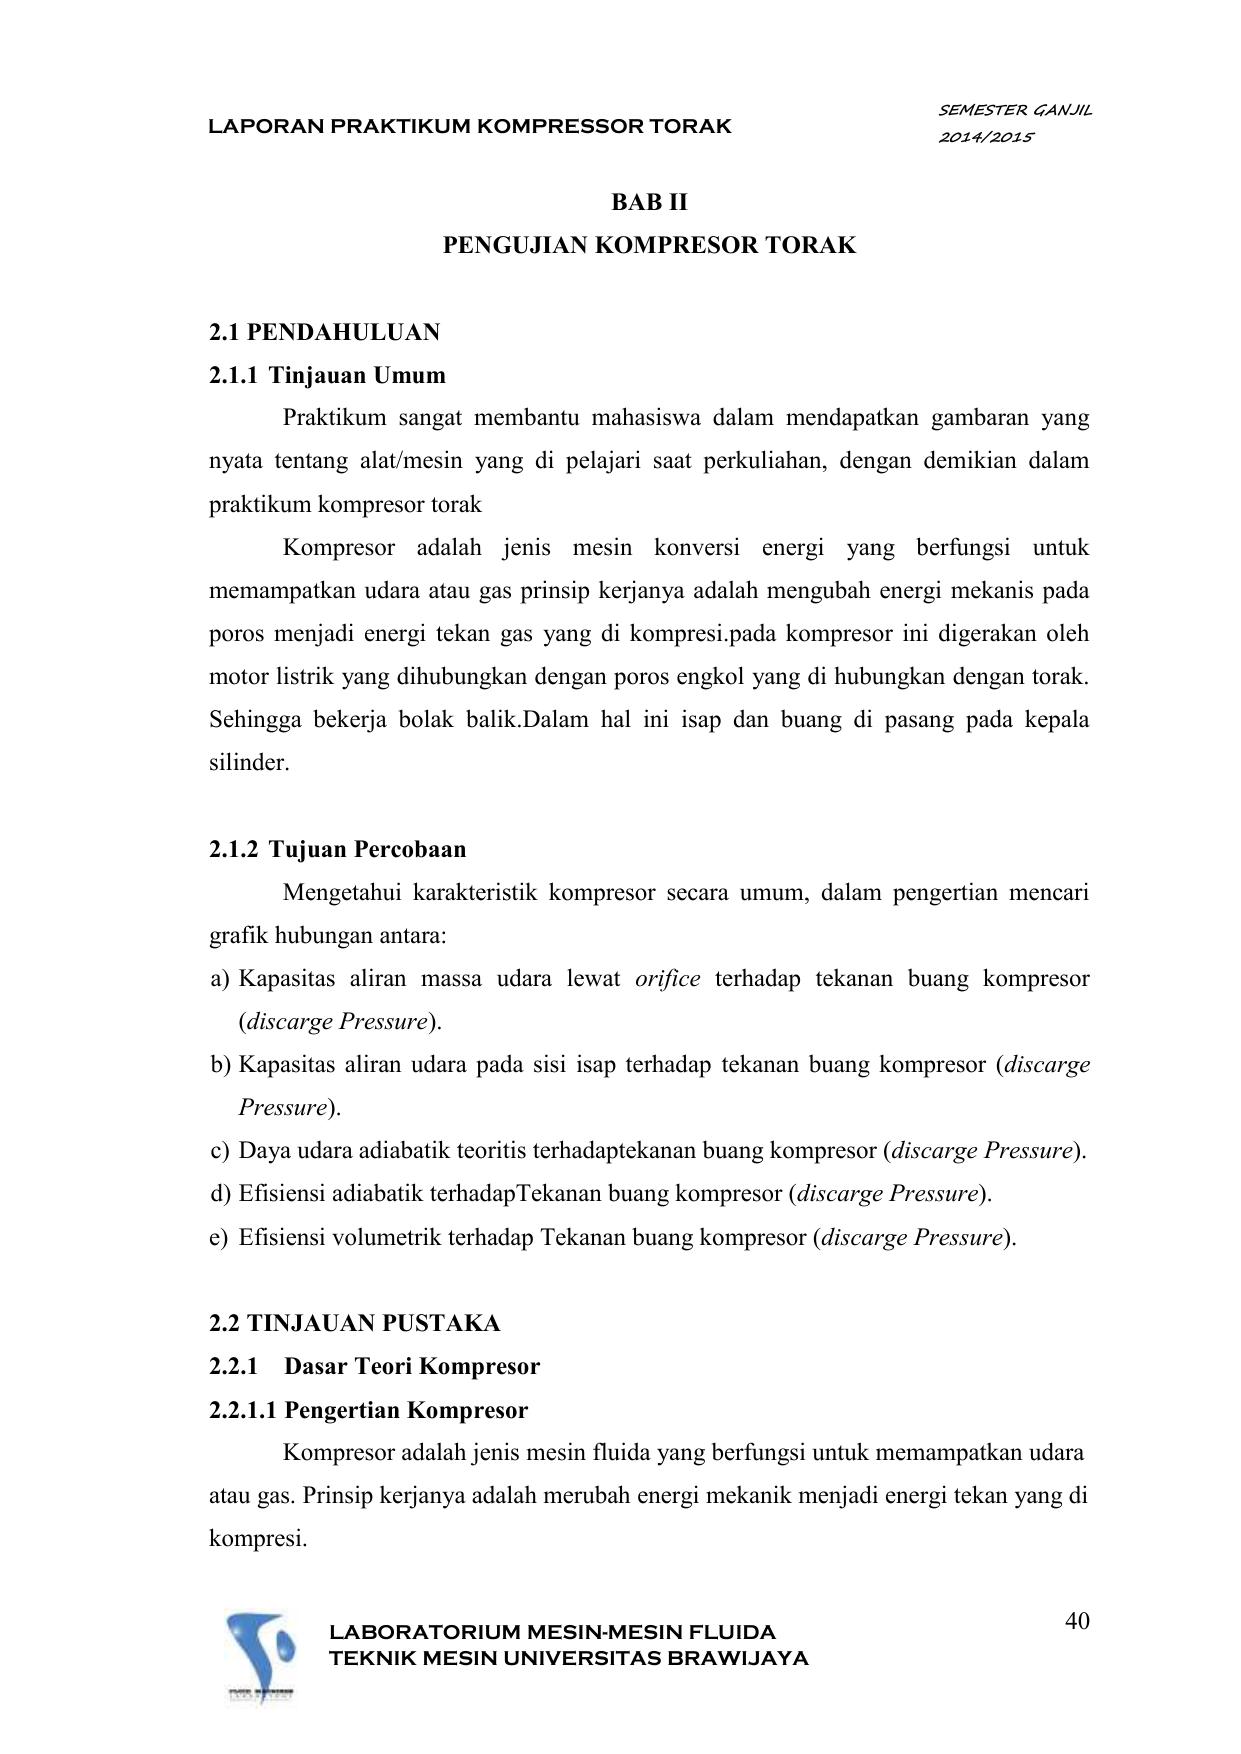 Laporan Praktikum Kompressor Torak Semester